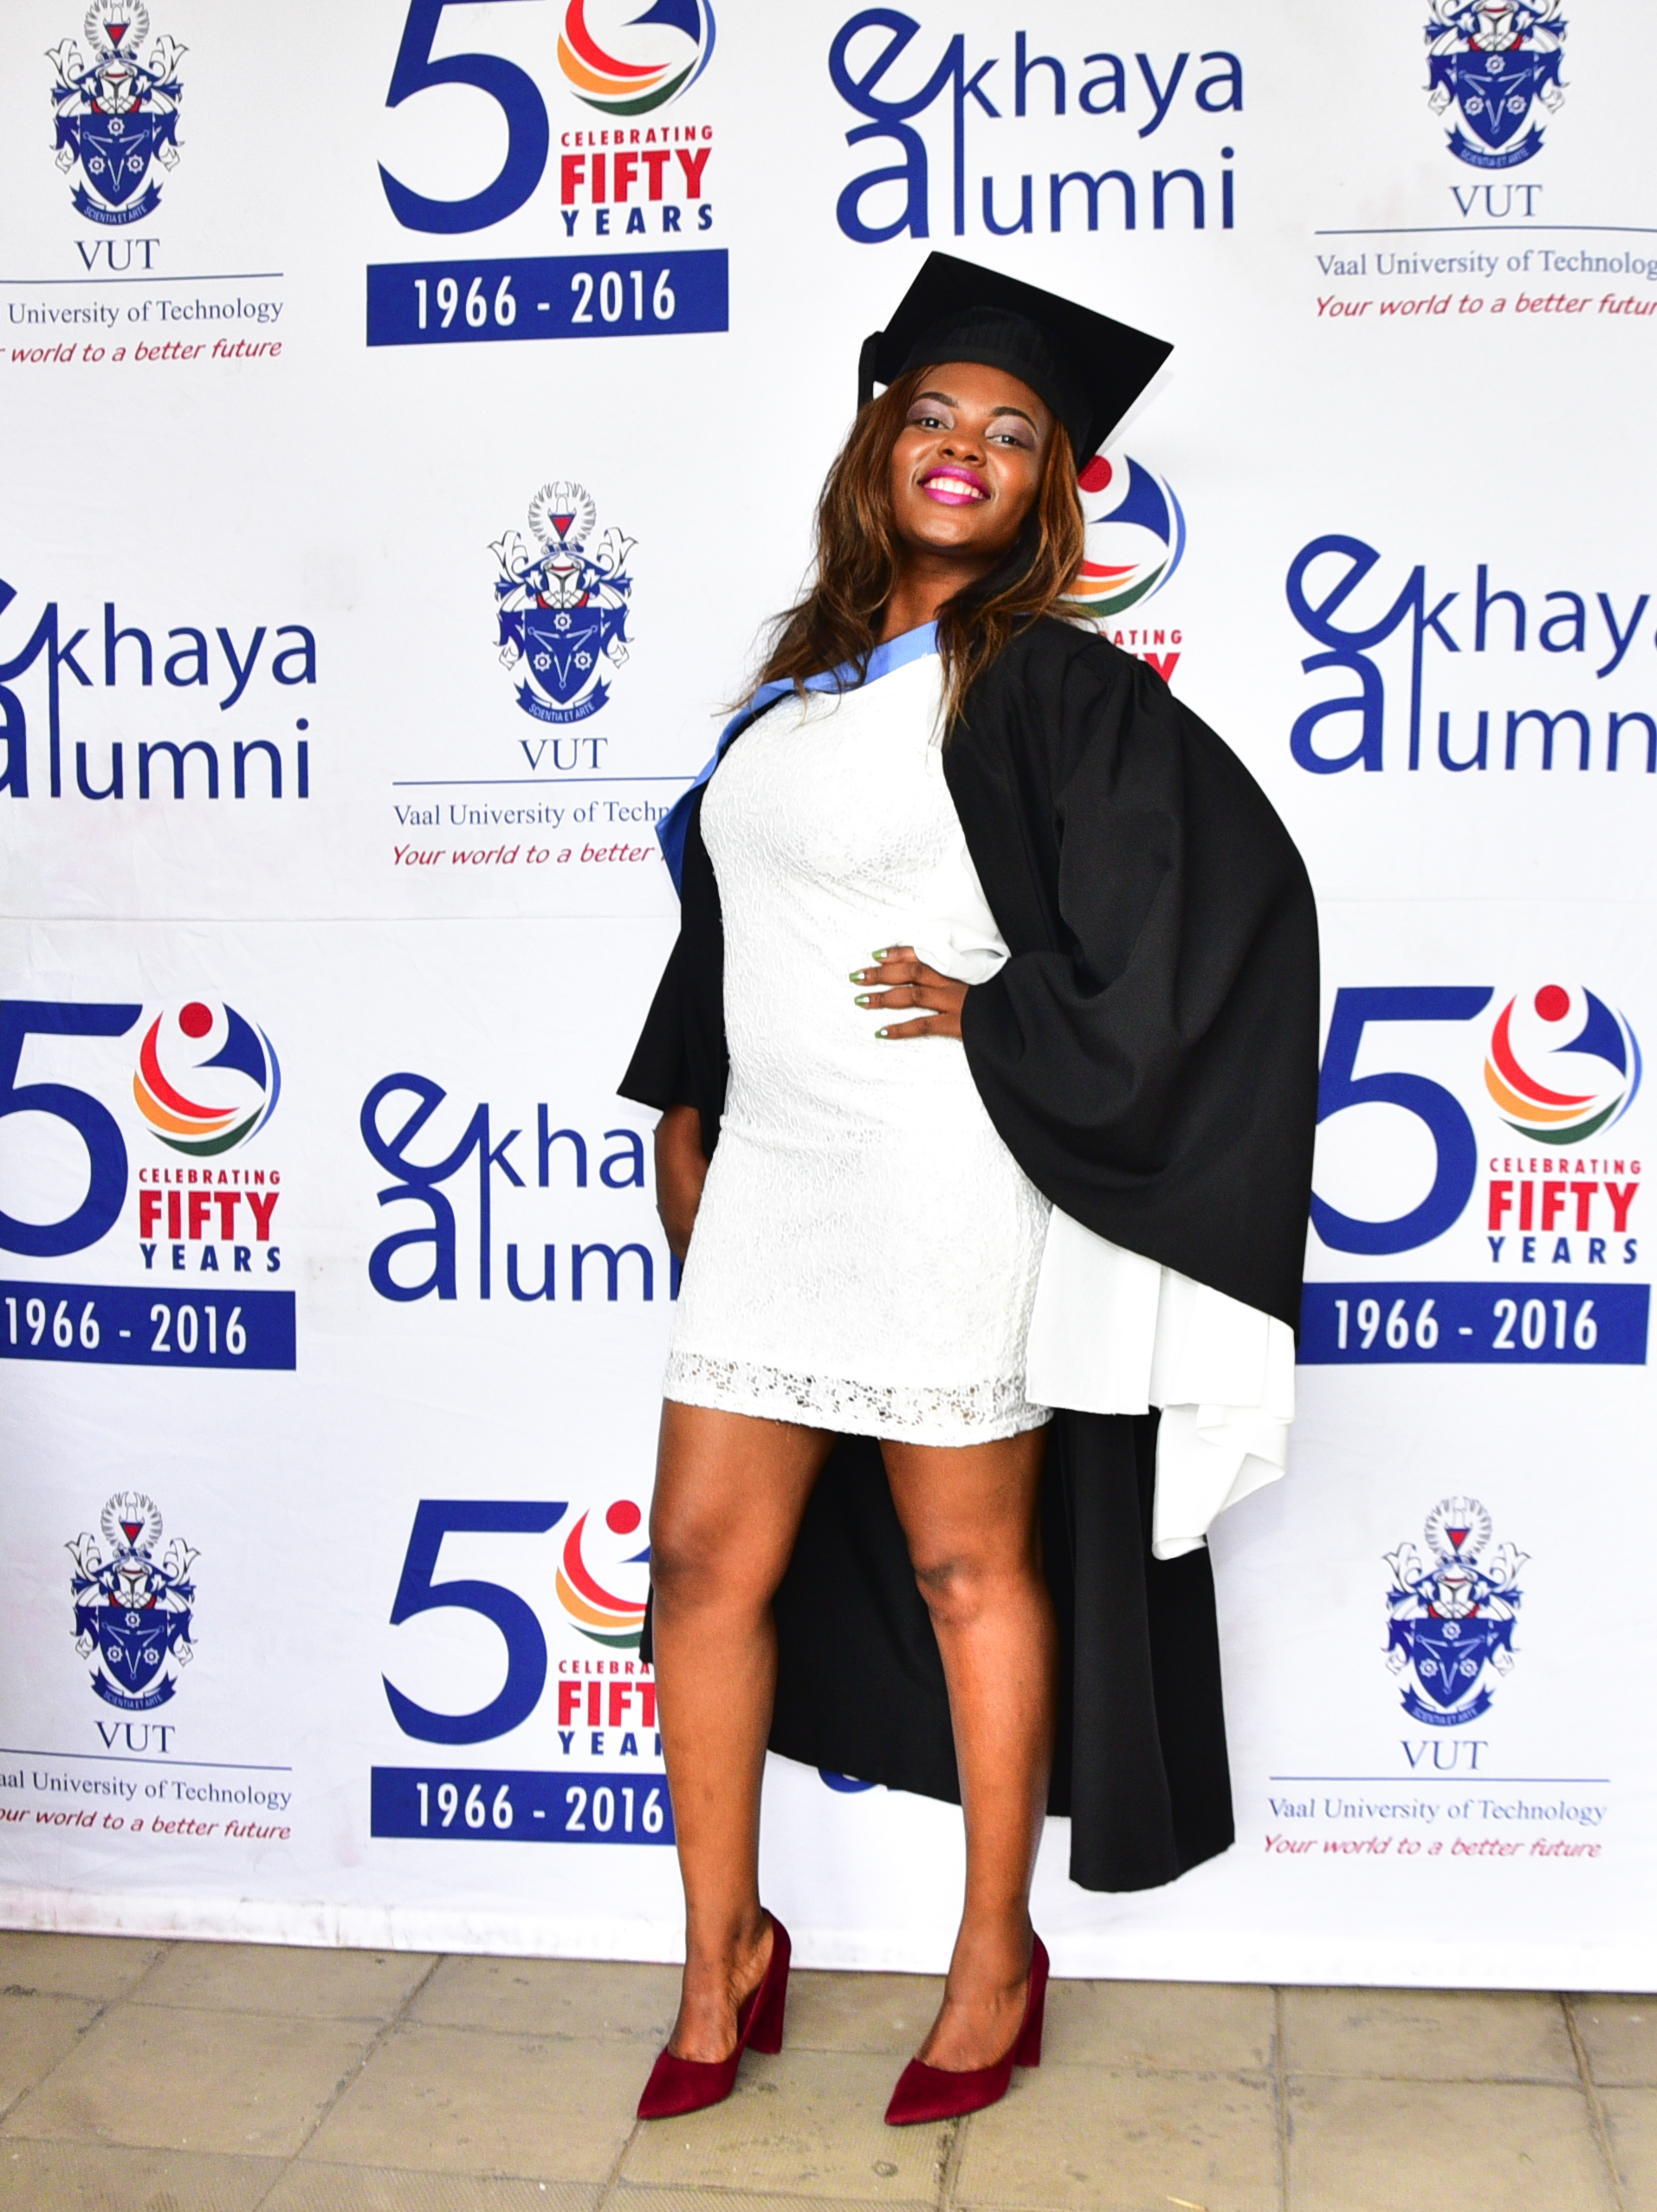 International student broke barriers & now celebrates her